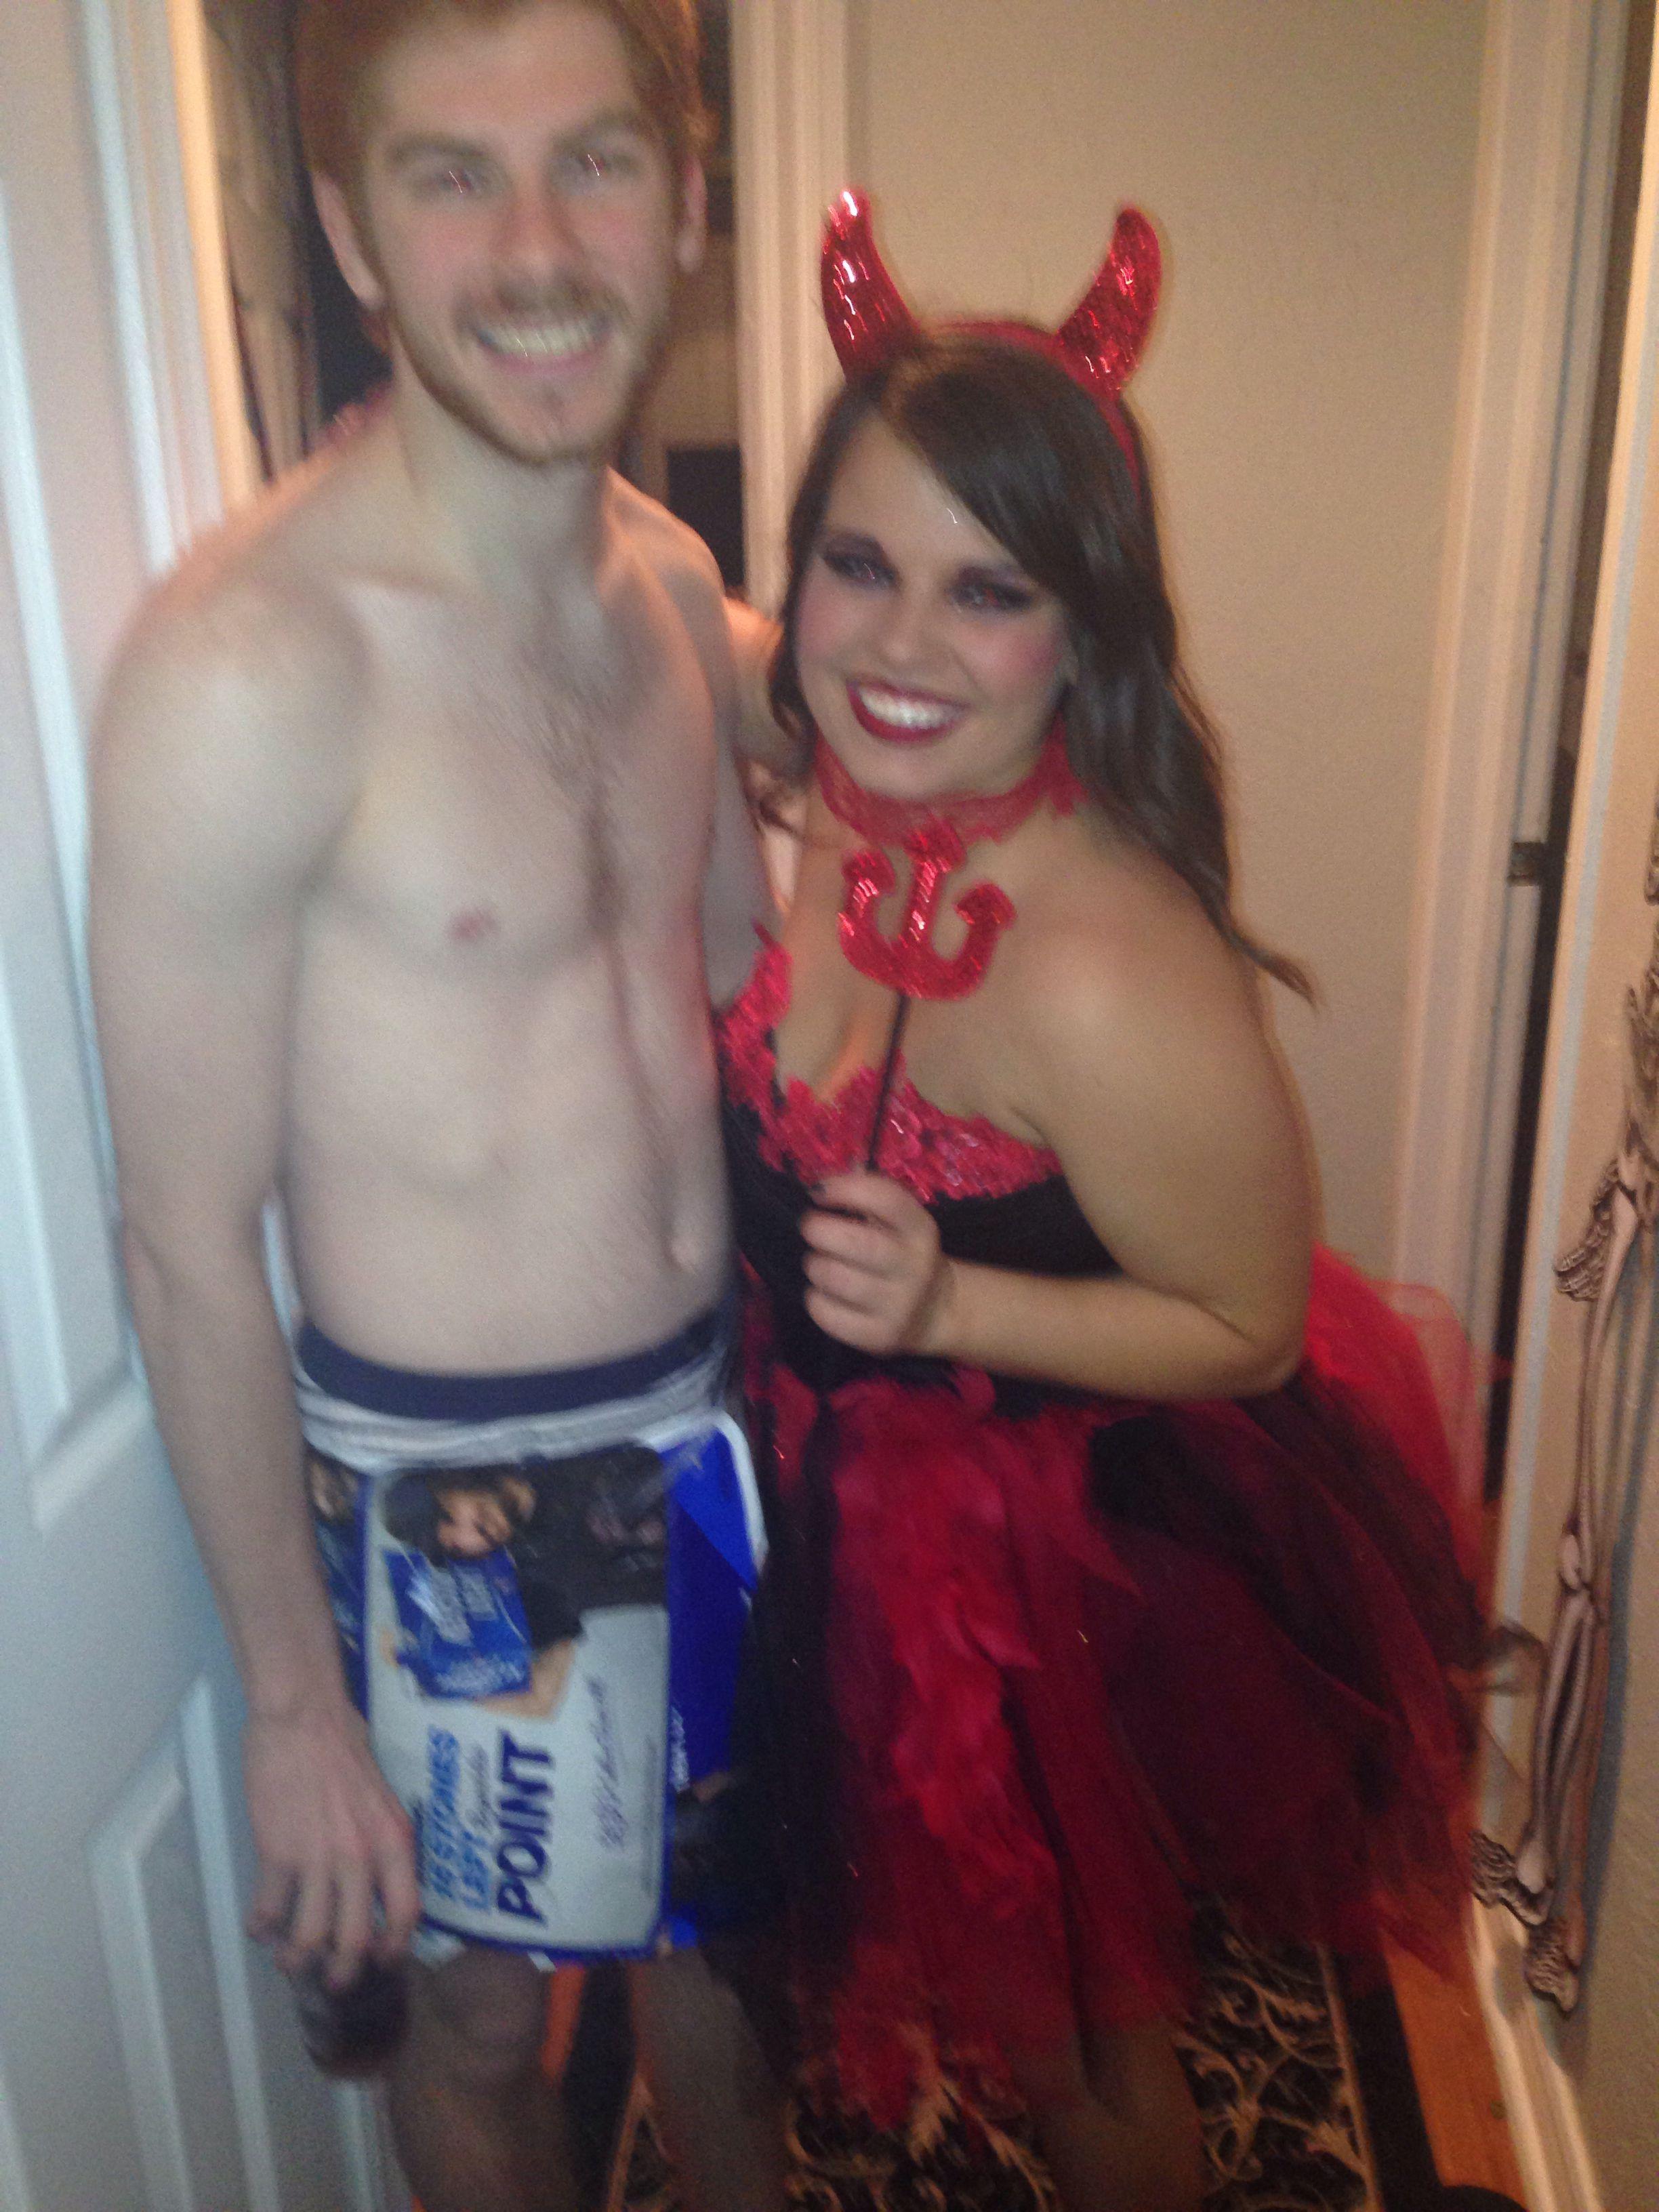 beer box skirt, abc costume ideas   abc costume ideas   pinterest